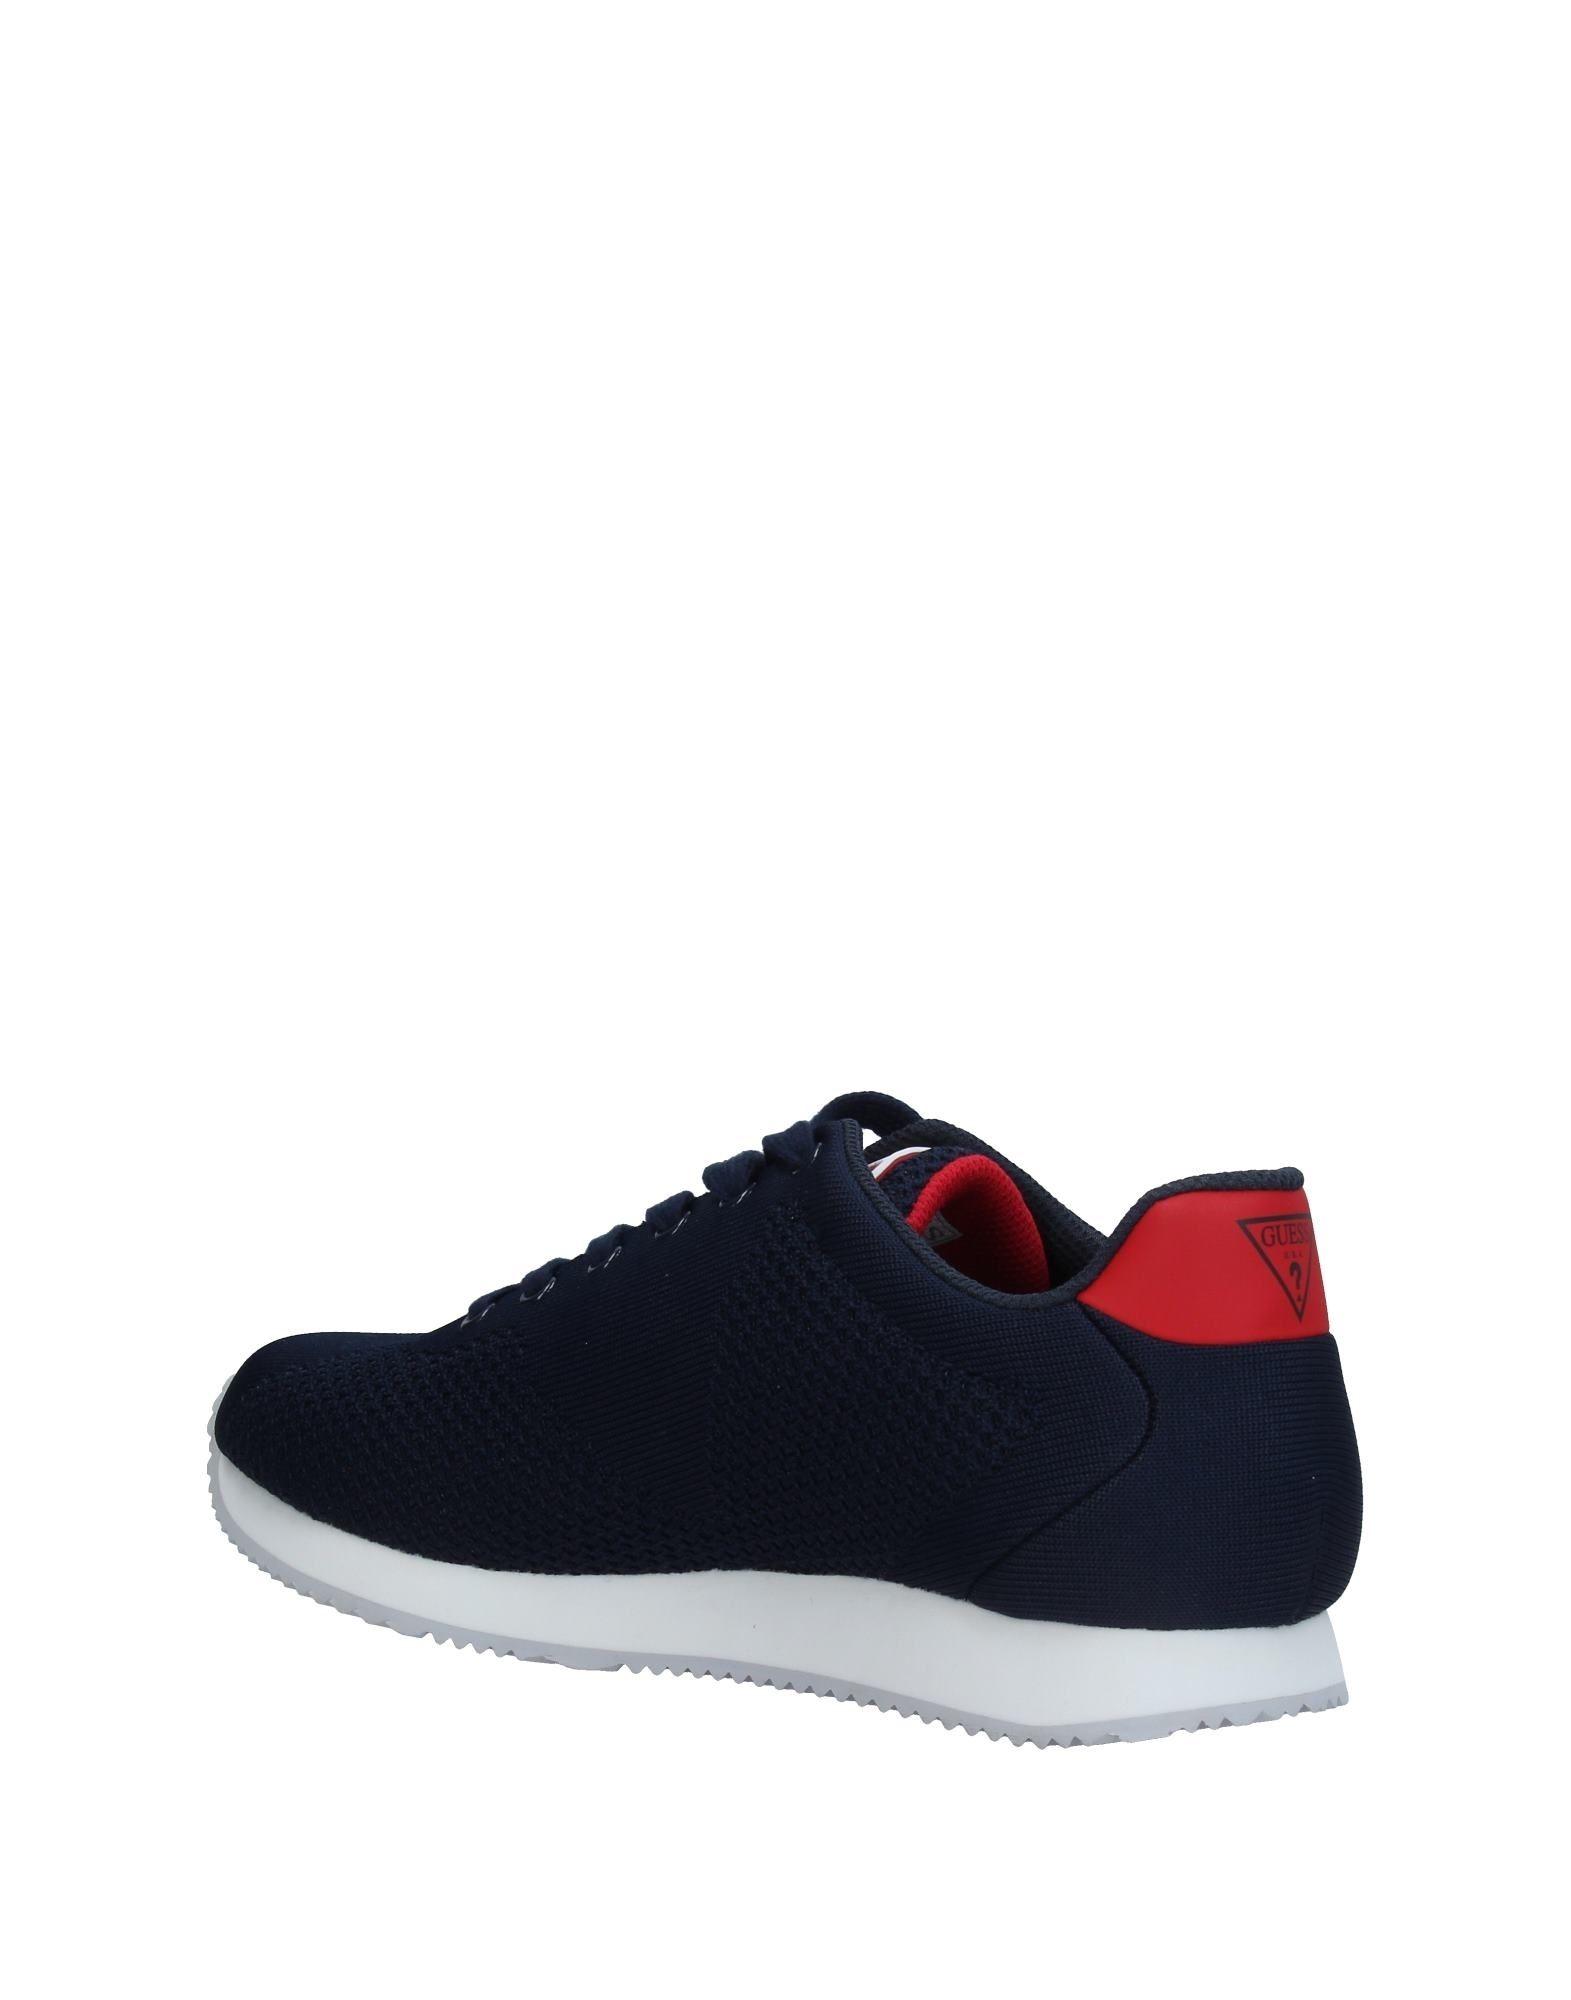 Guess Sneakers Herren  Schuhe 11329646UT Heiße Schuhe  16baed